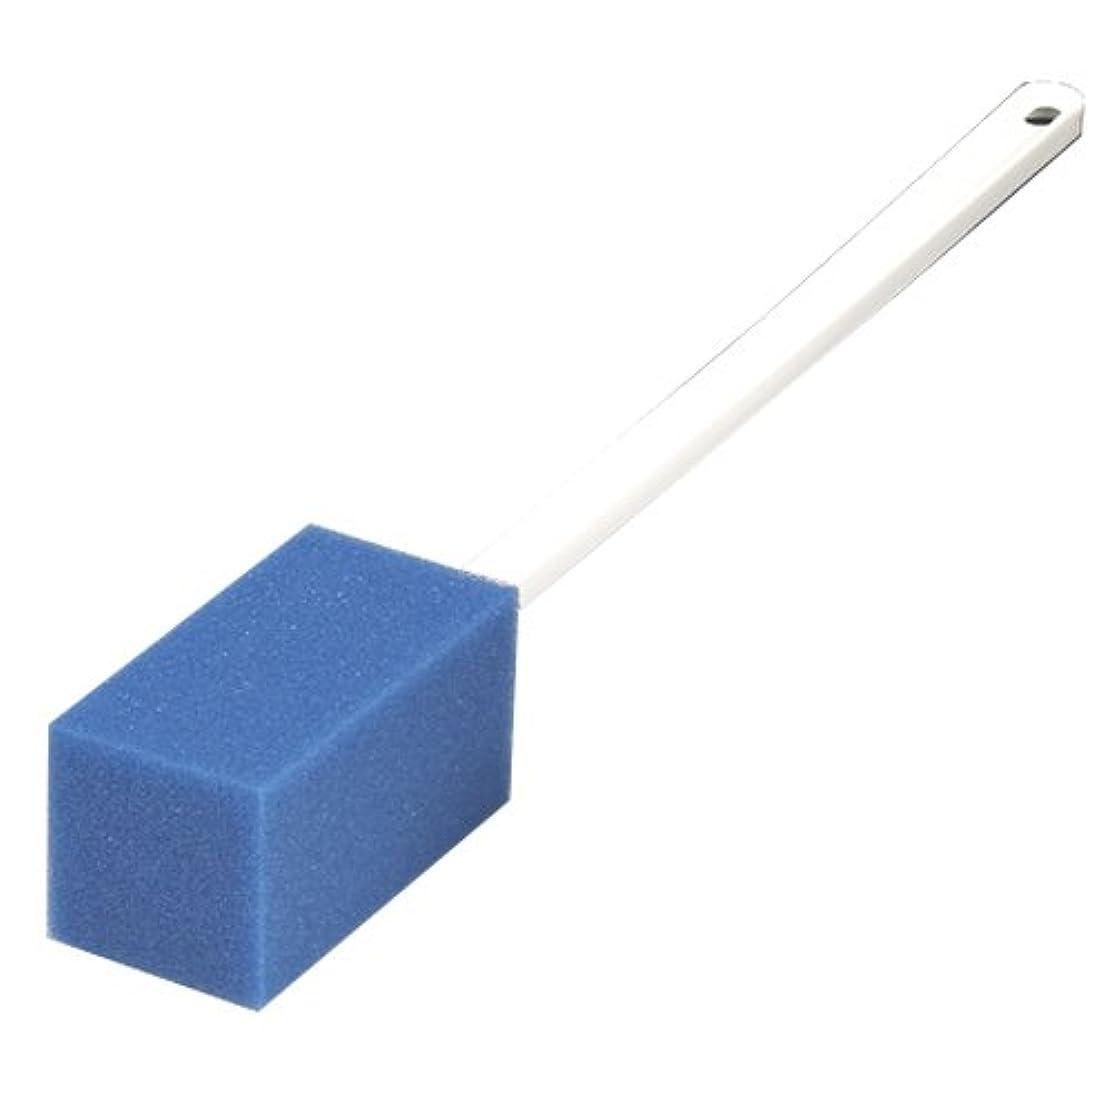 Scrubbies 753510001 Rectangular Sponges by Maddak Inc.